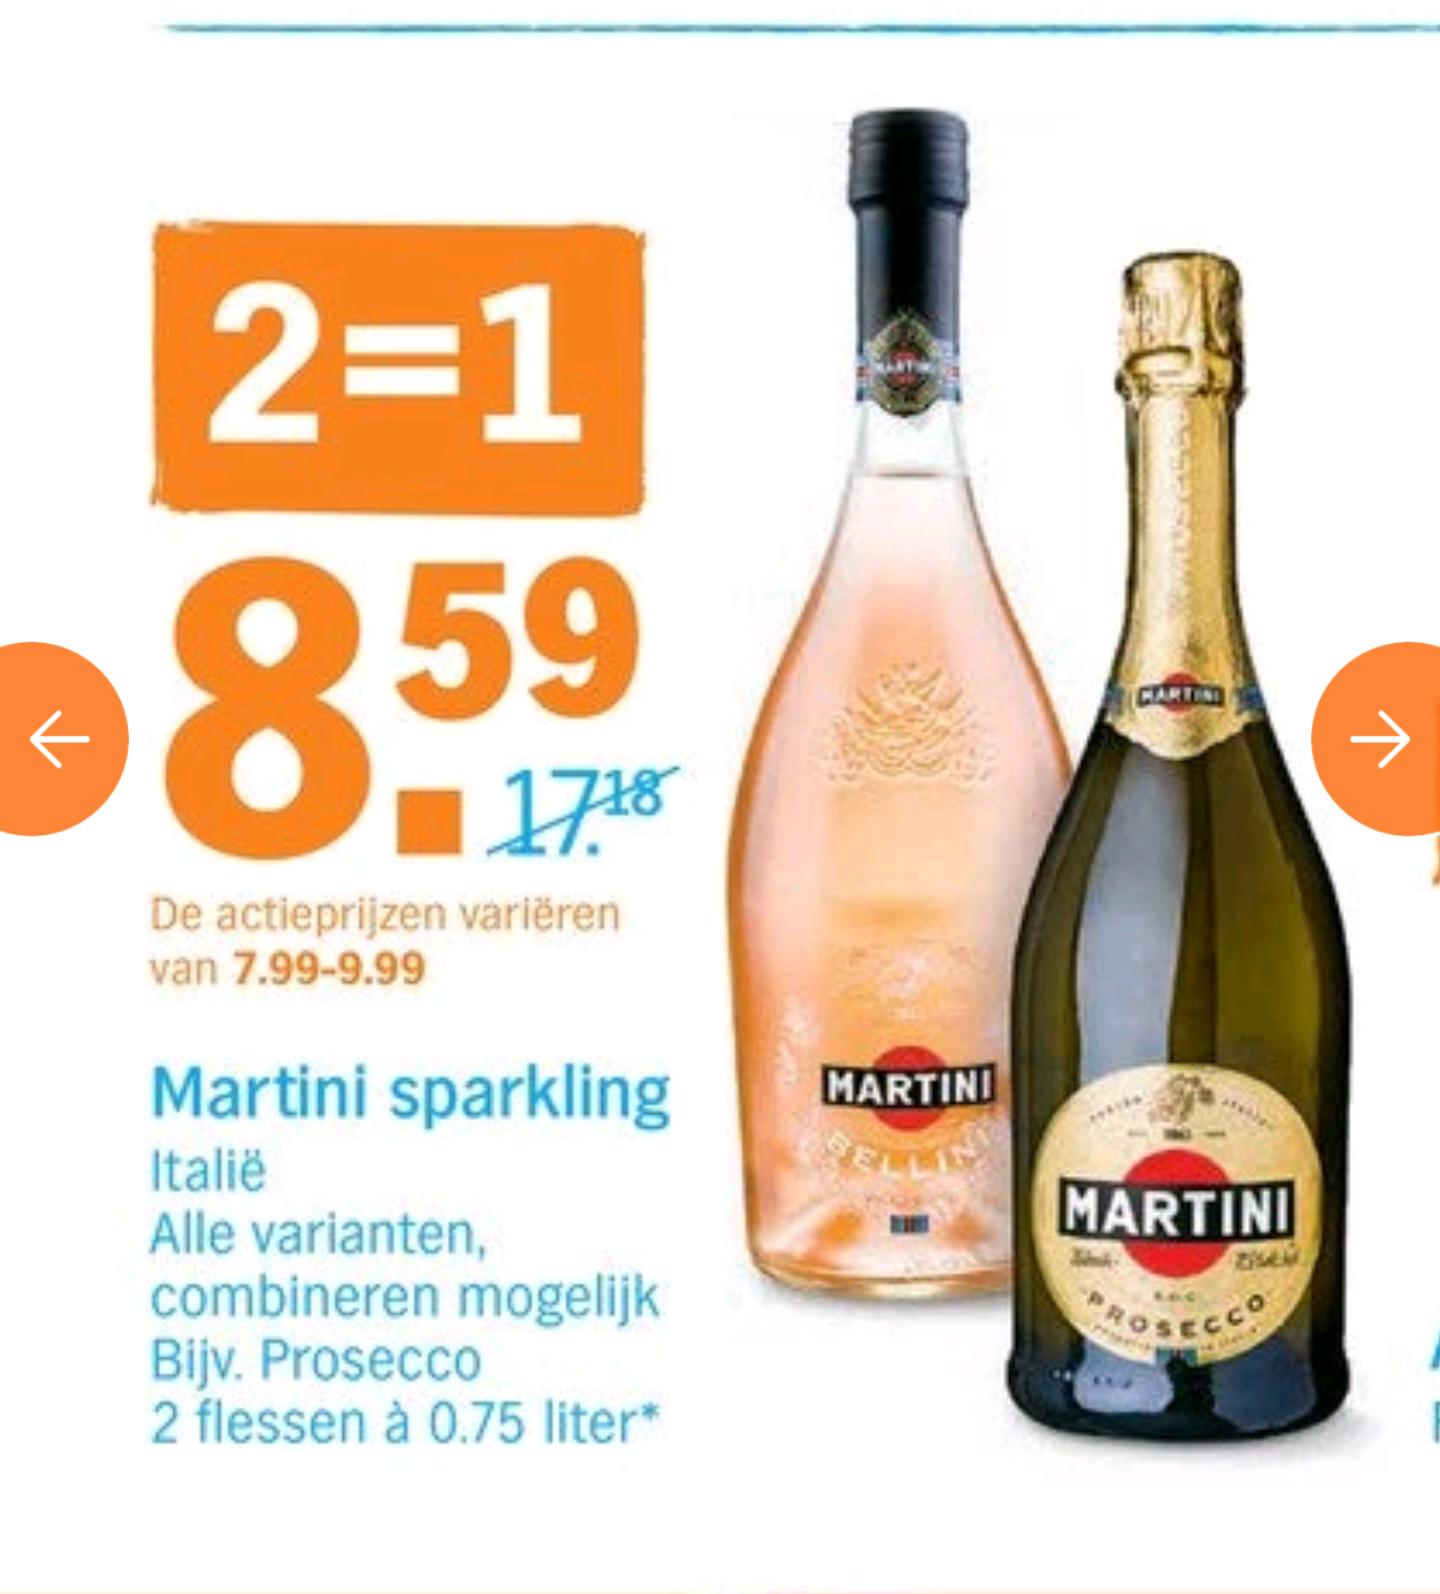 Martini Bellini en andere sparkling varianten 1+1 gratis